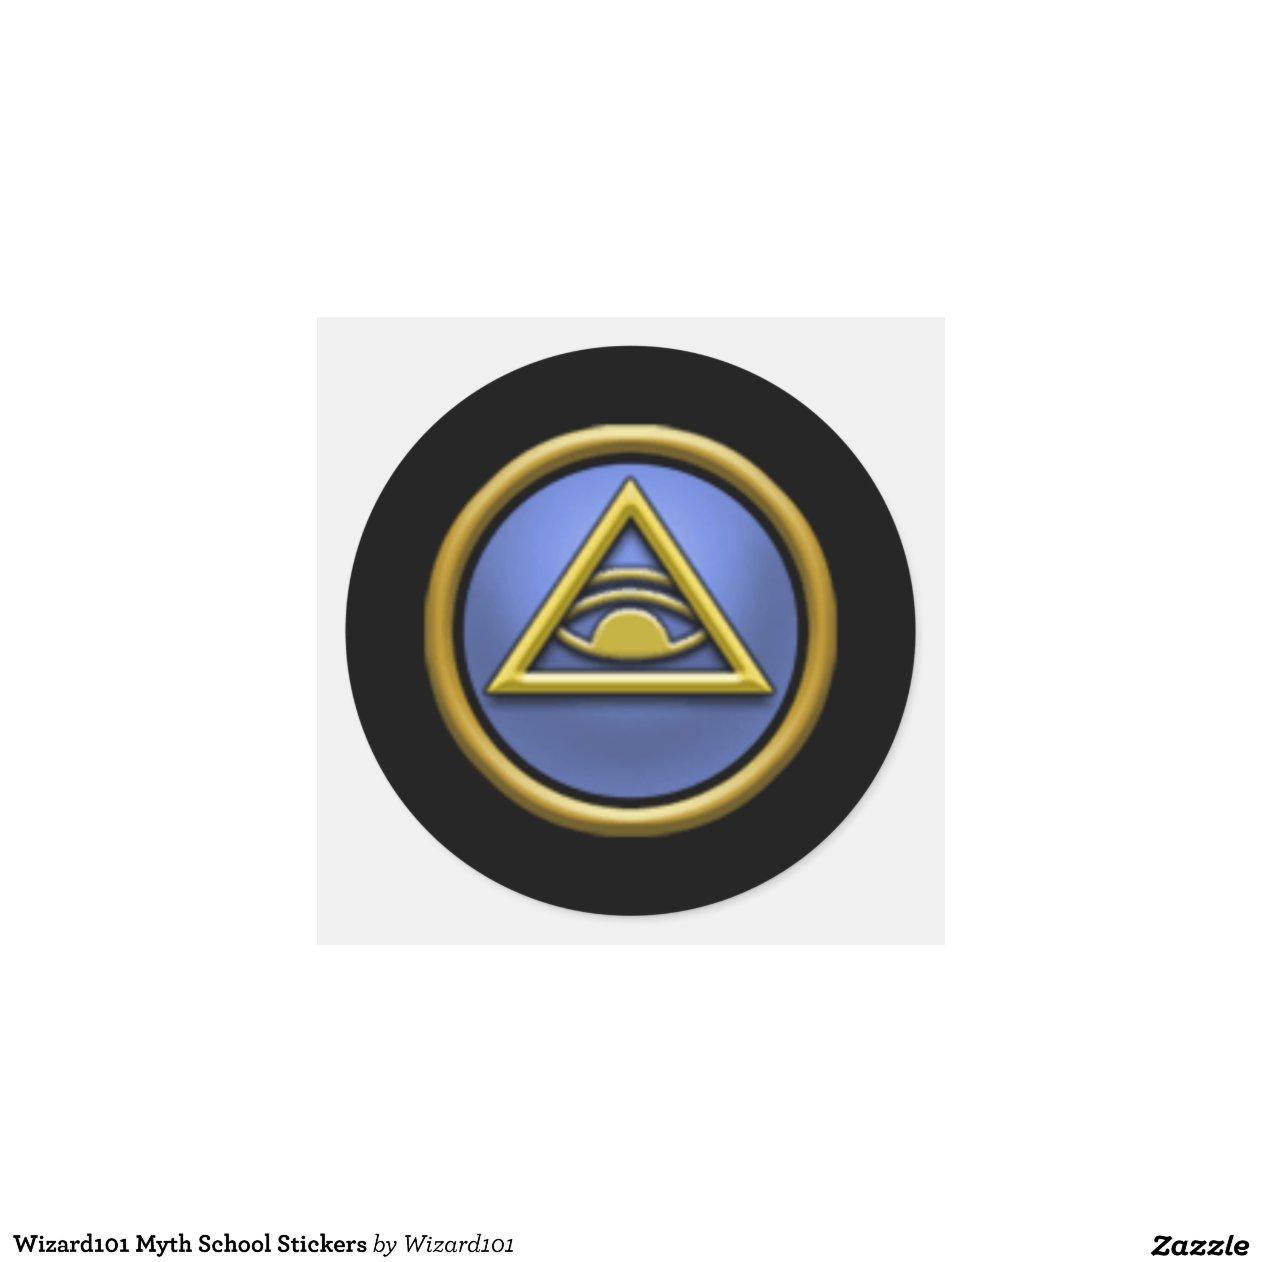 100+ Wizard 101 Myth School – yasminroohi